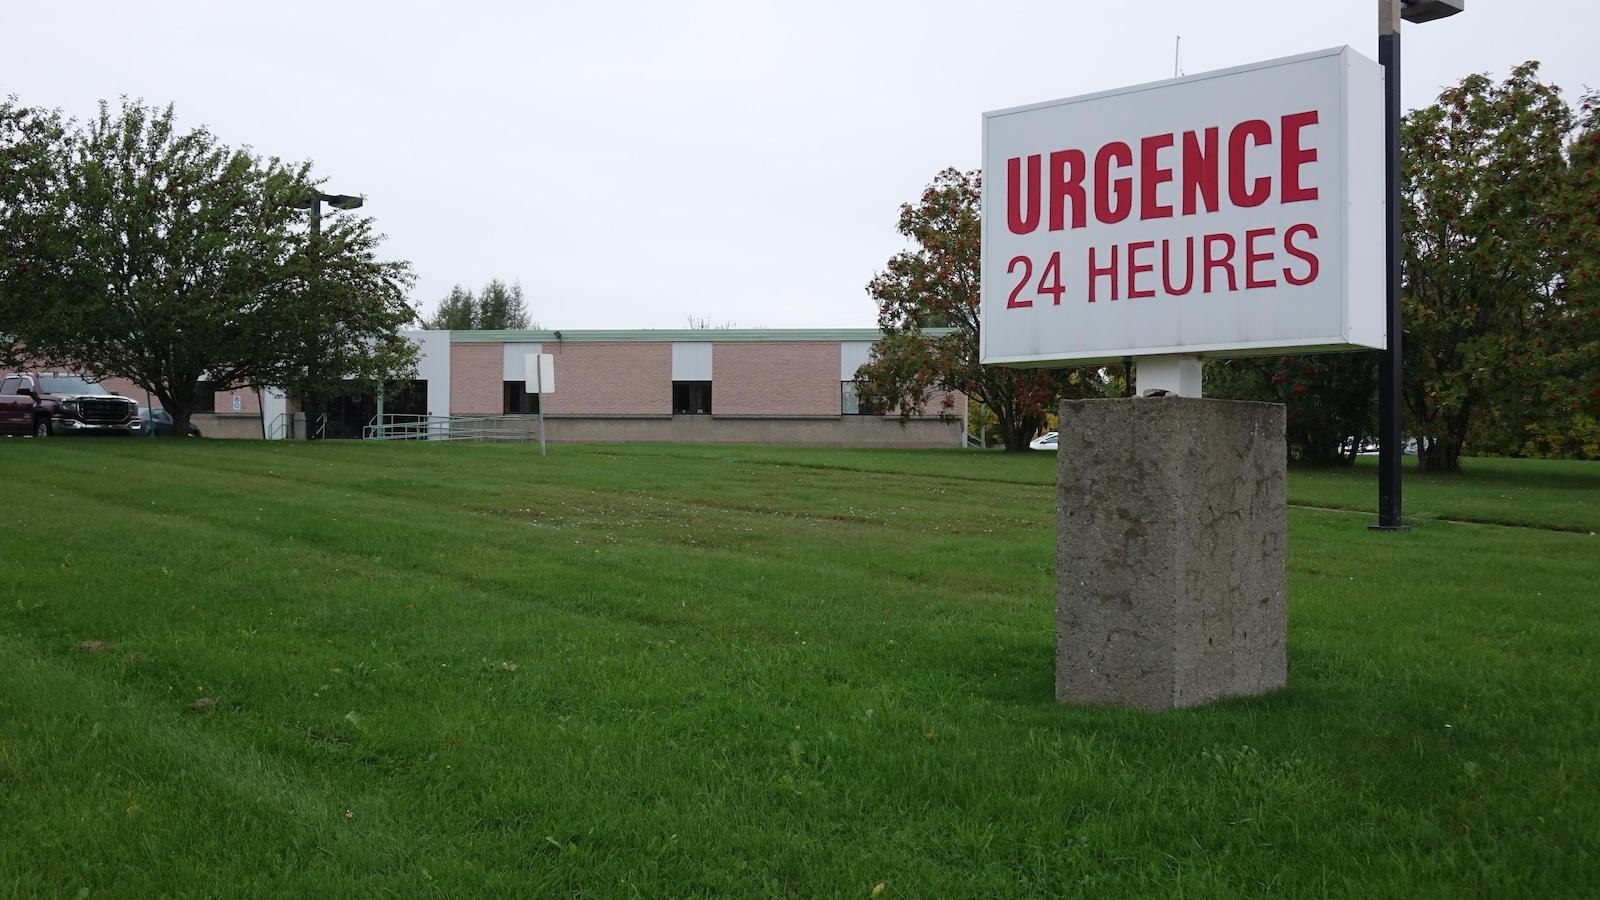 Affiche Ugence 24 heures et bâtiment derrière